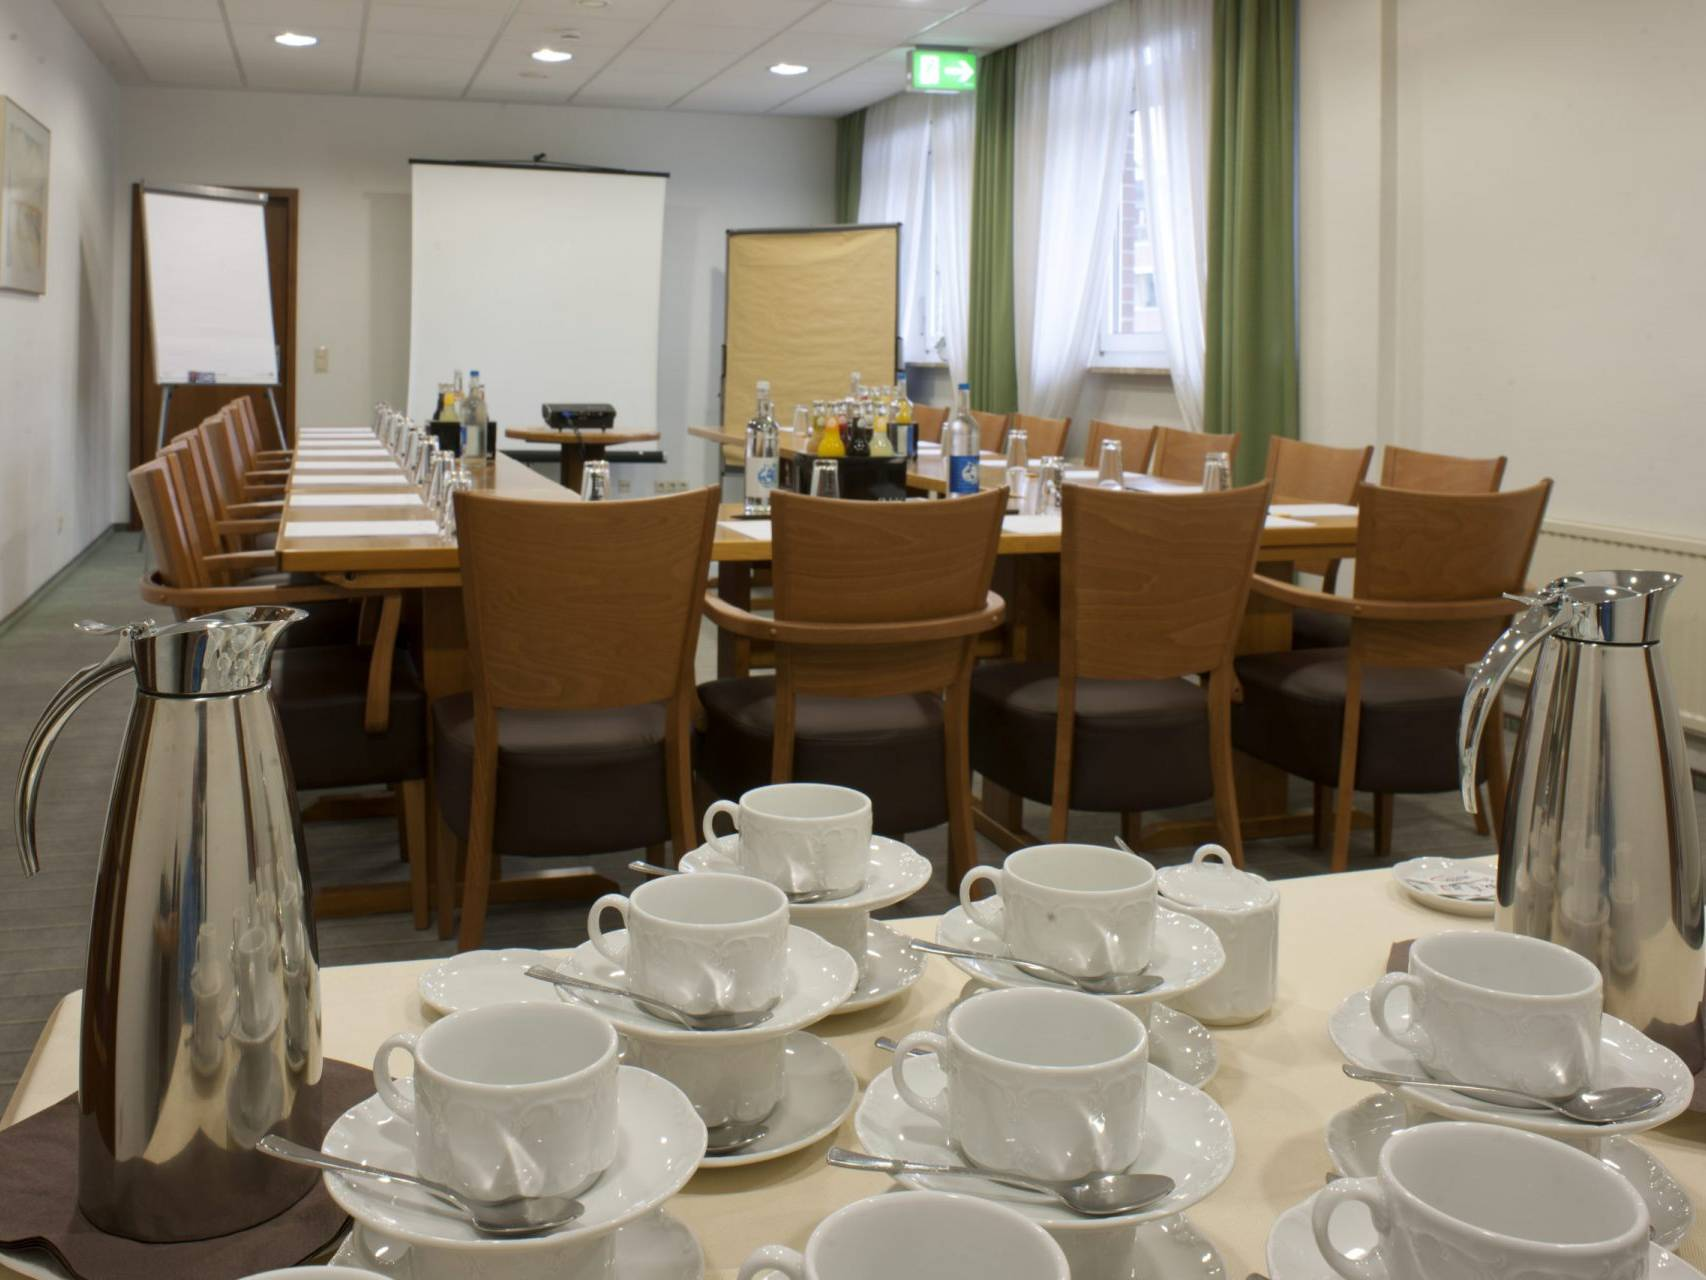 Konferenzraum Hotel am Stadtpark Buxtehude 3 scaled uai